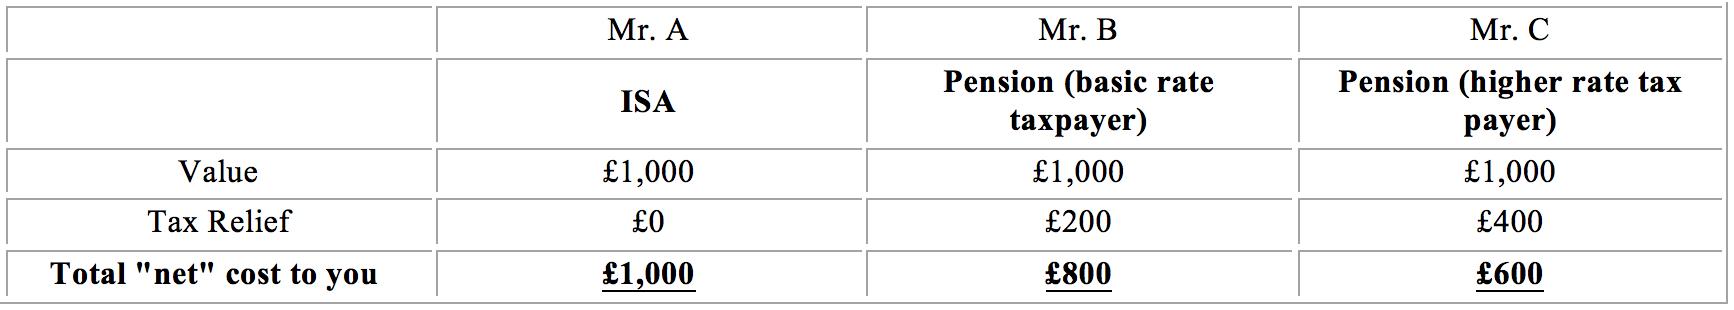 Pension versus ISA tax relief advantages